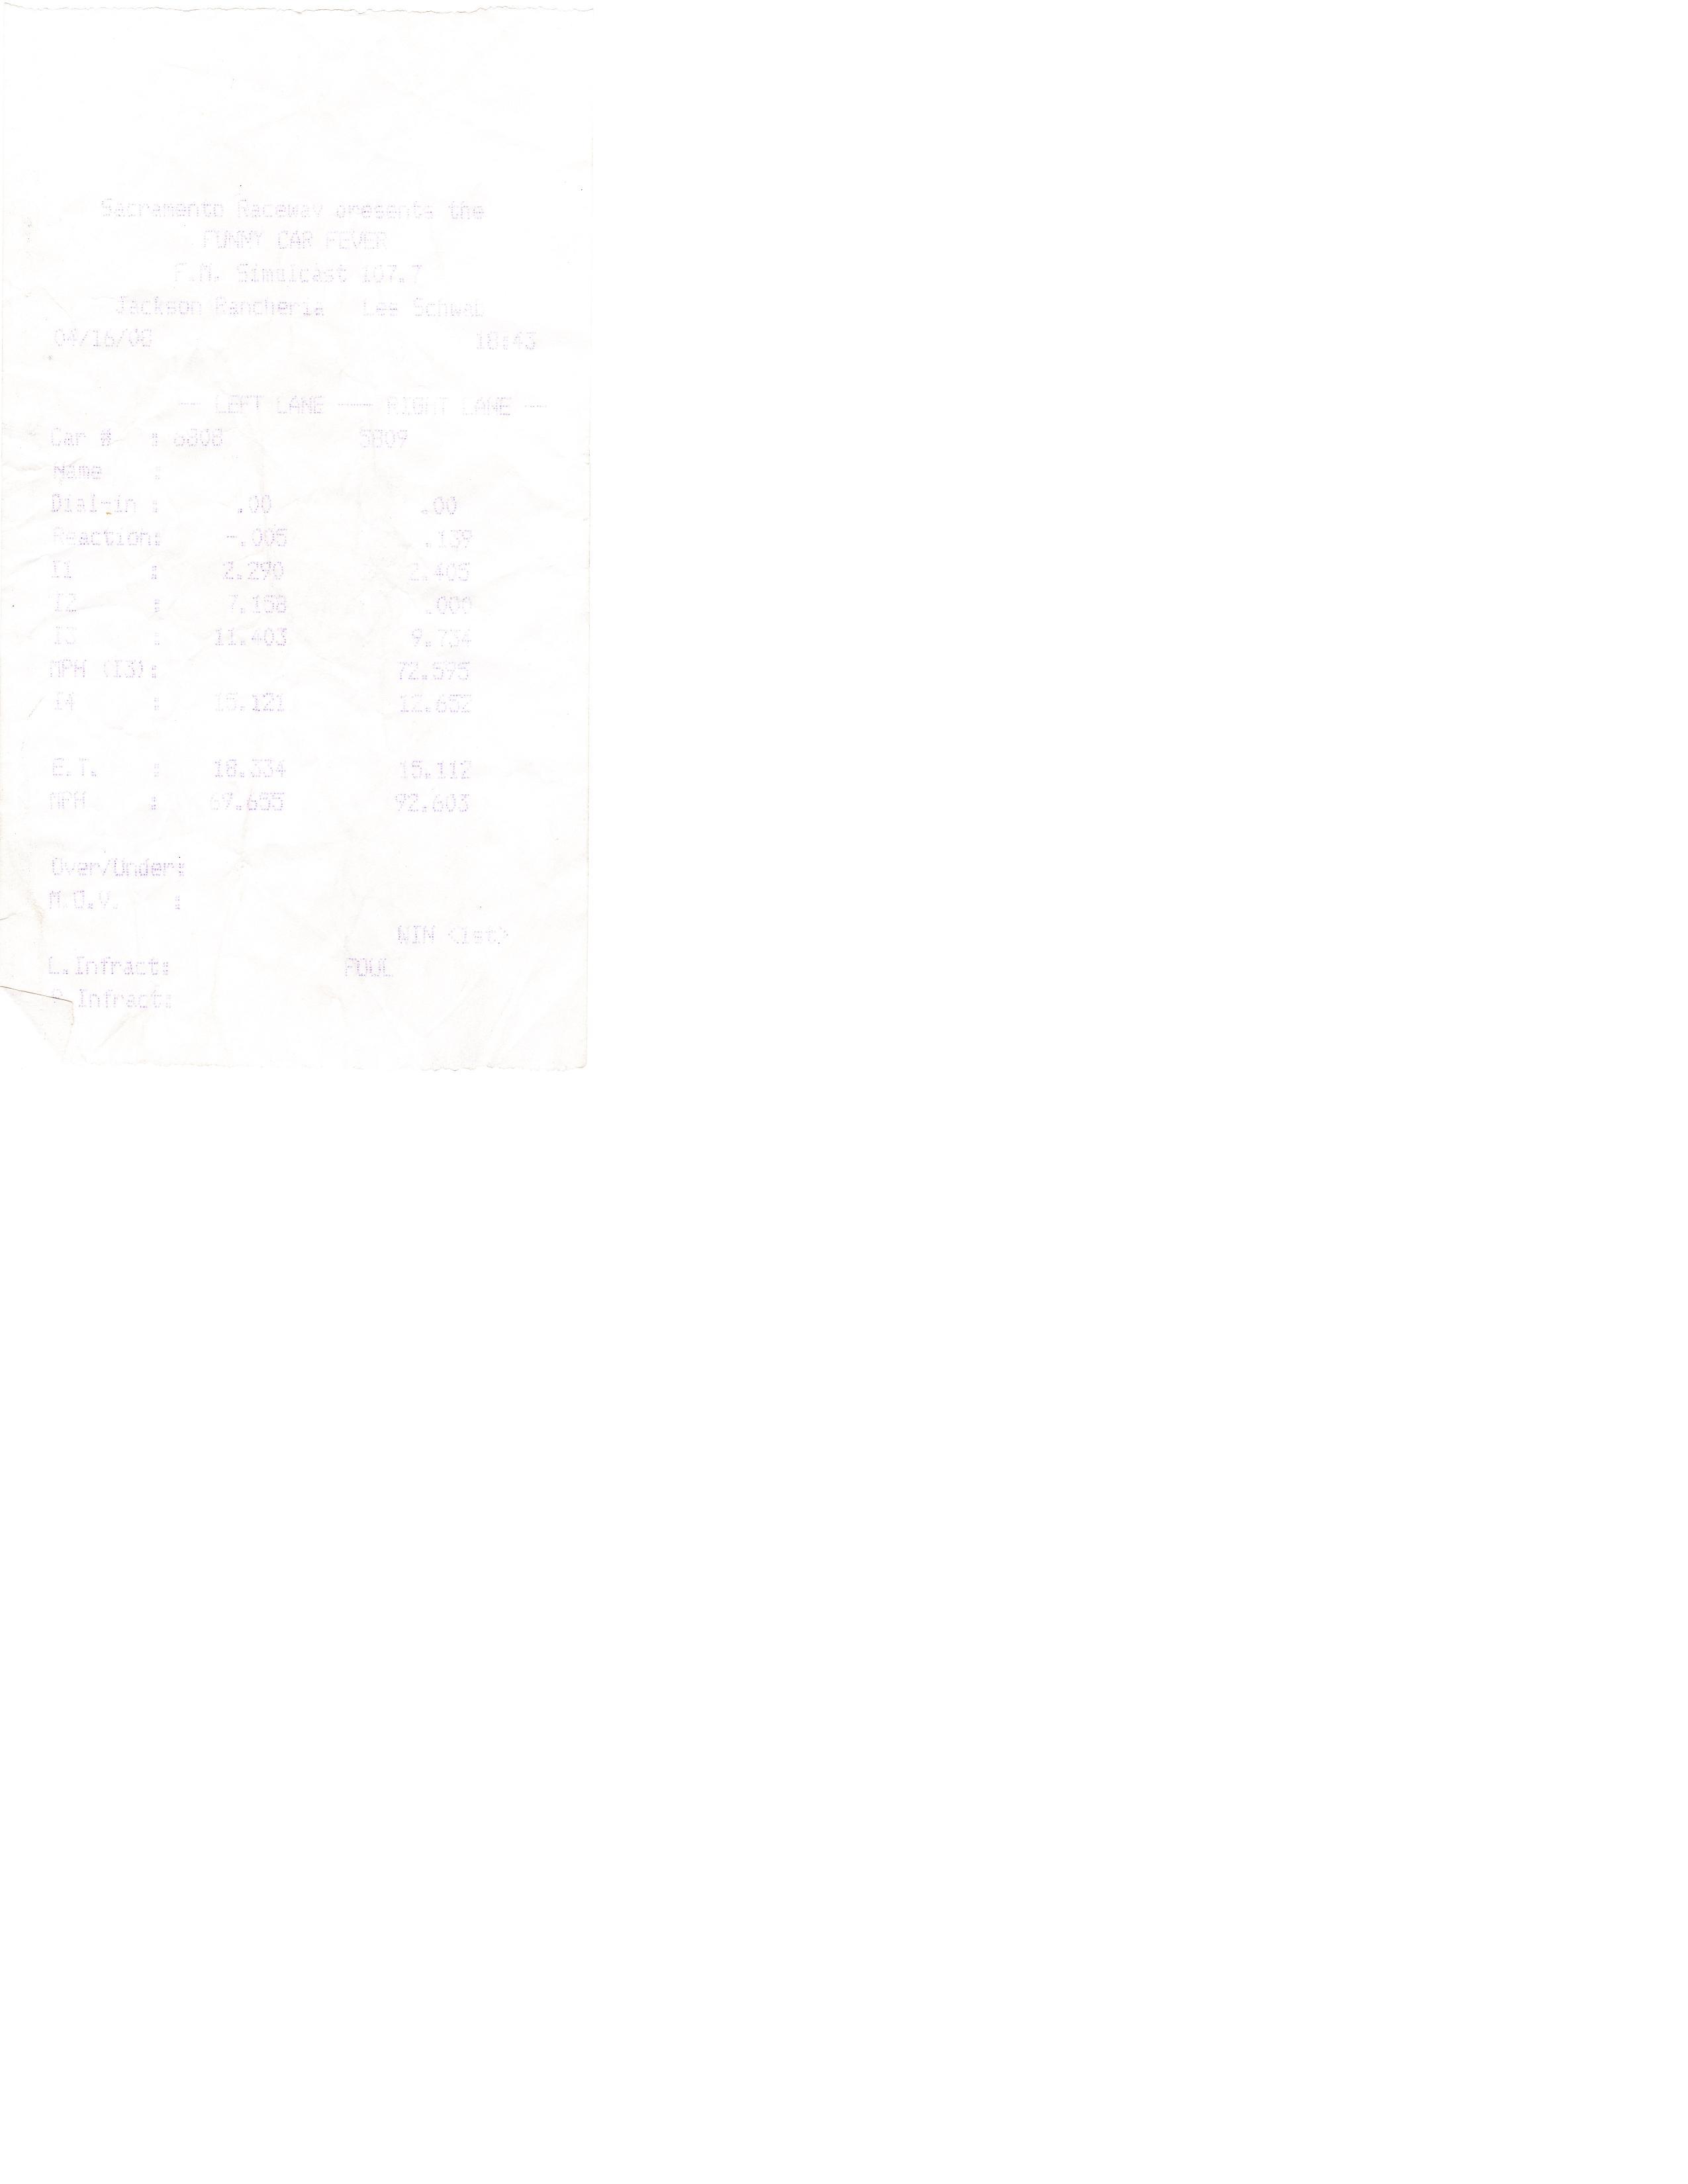 Acura Integra Timeslip Scan